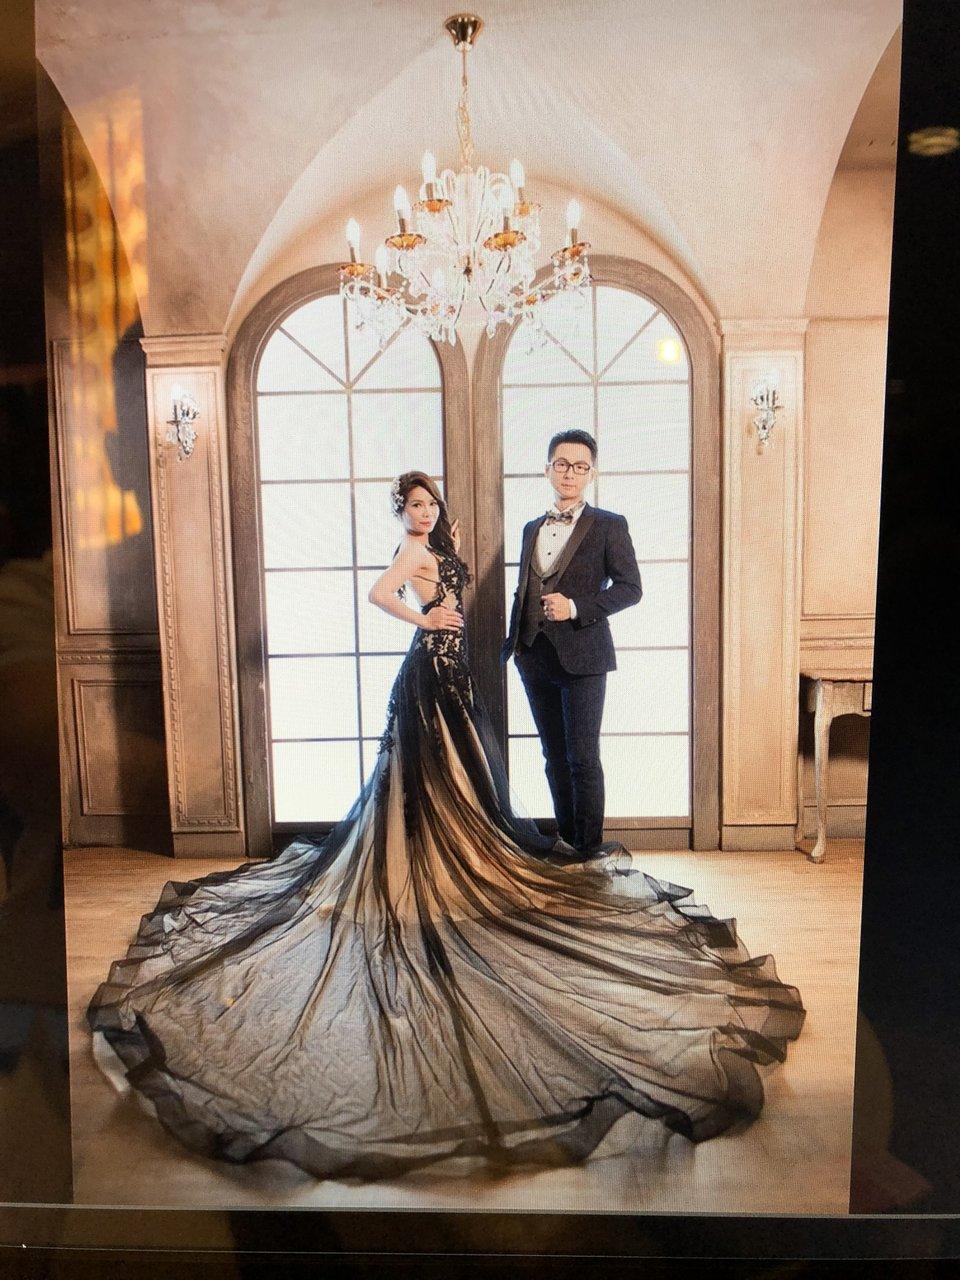 TIFFANY | 台中帝芬妮精品婚紗,帝芬妮婚紗